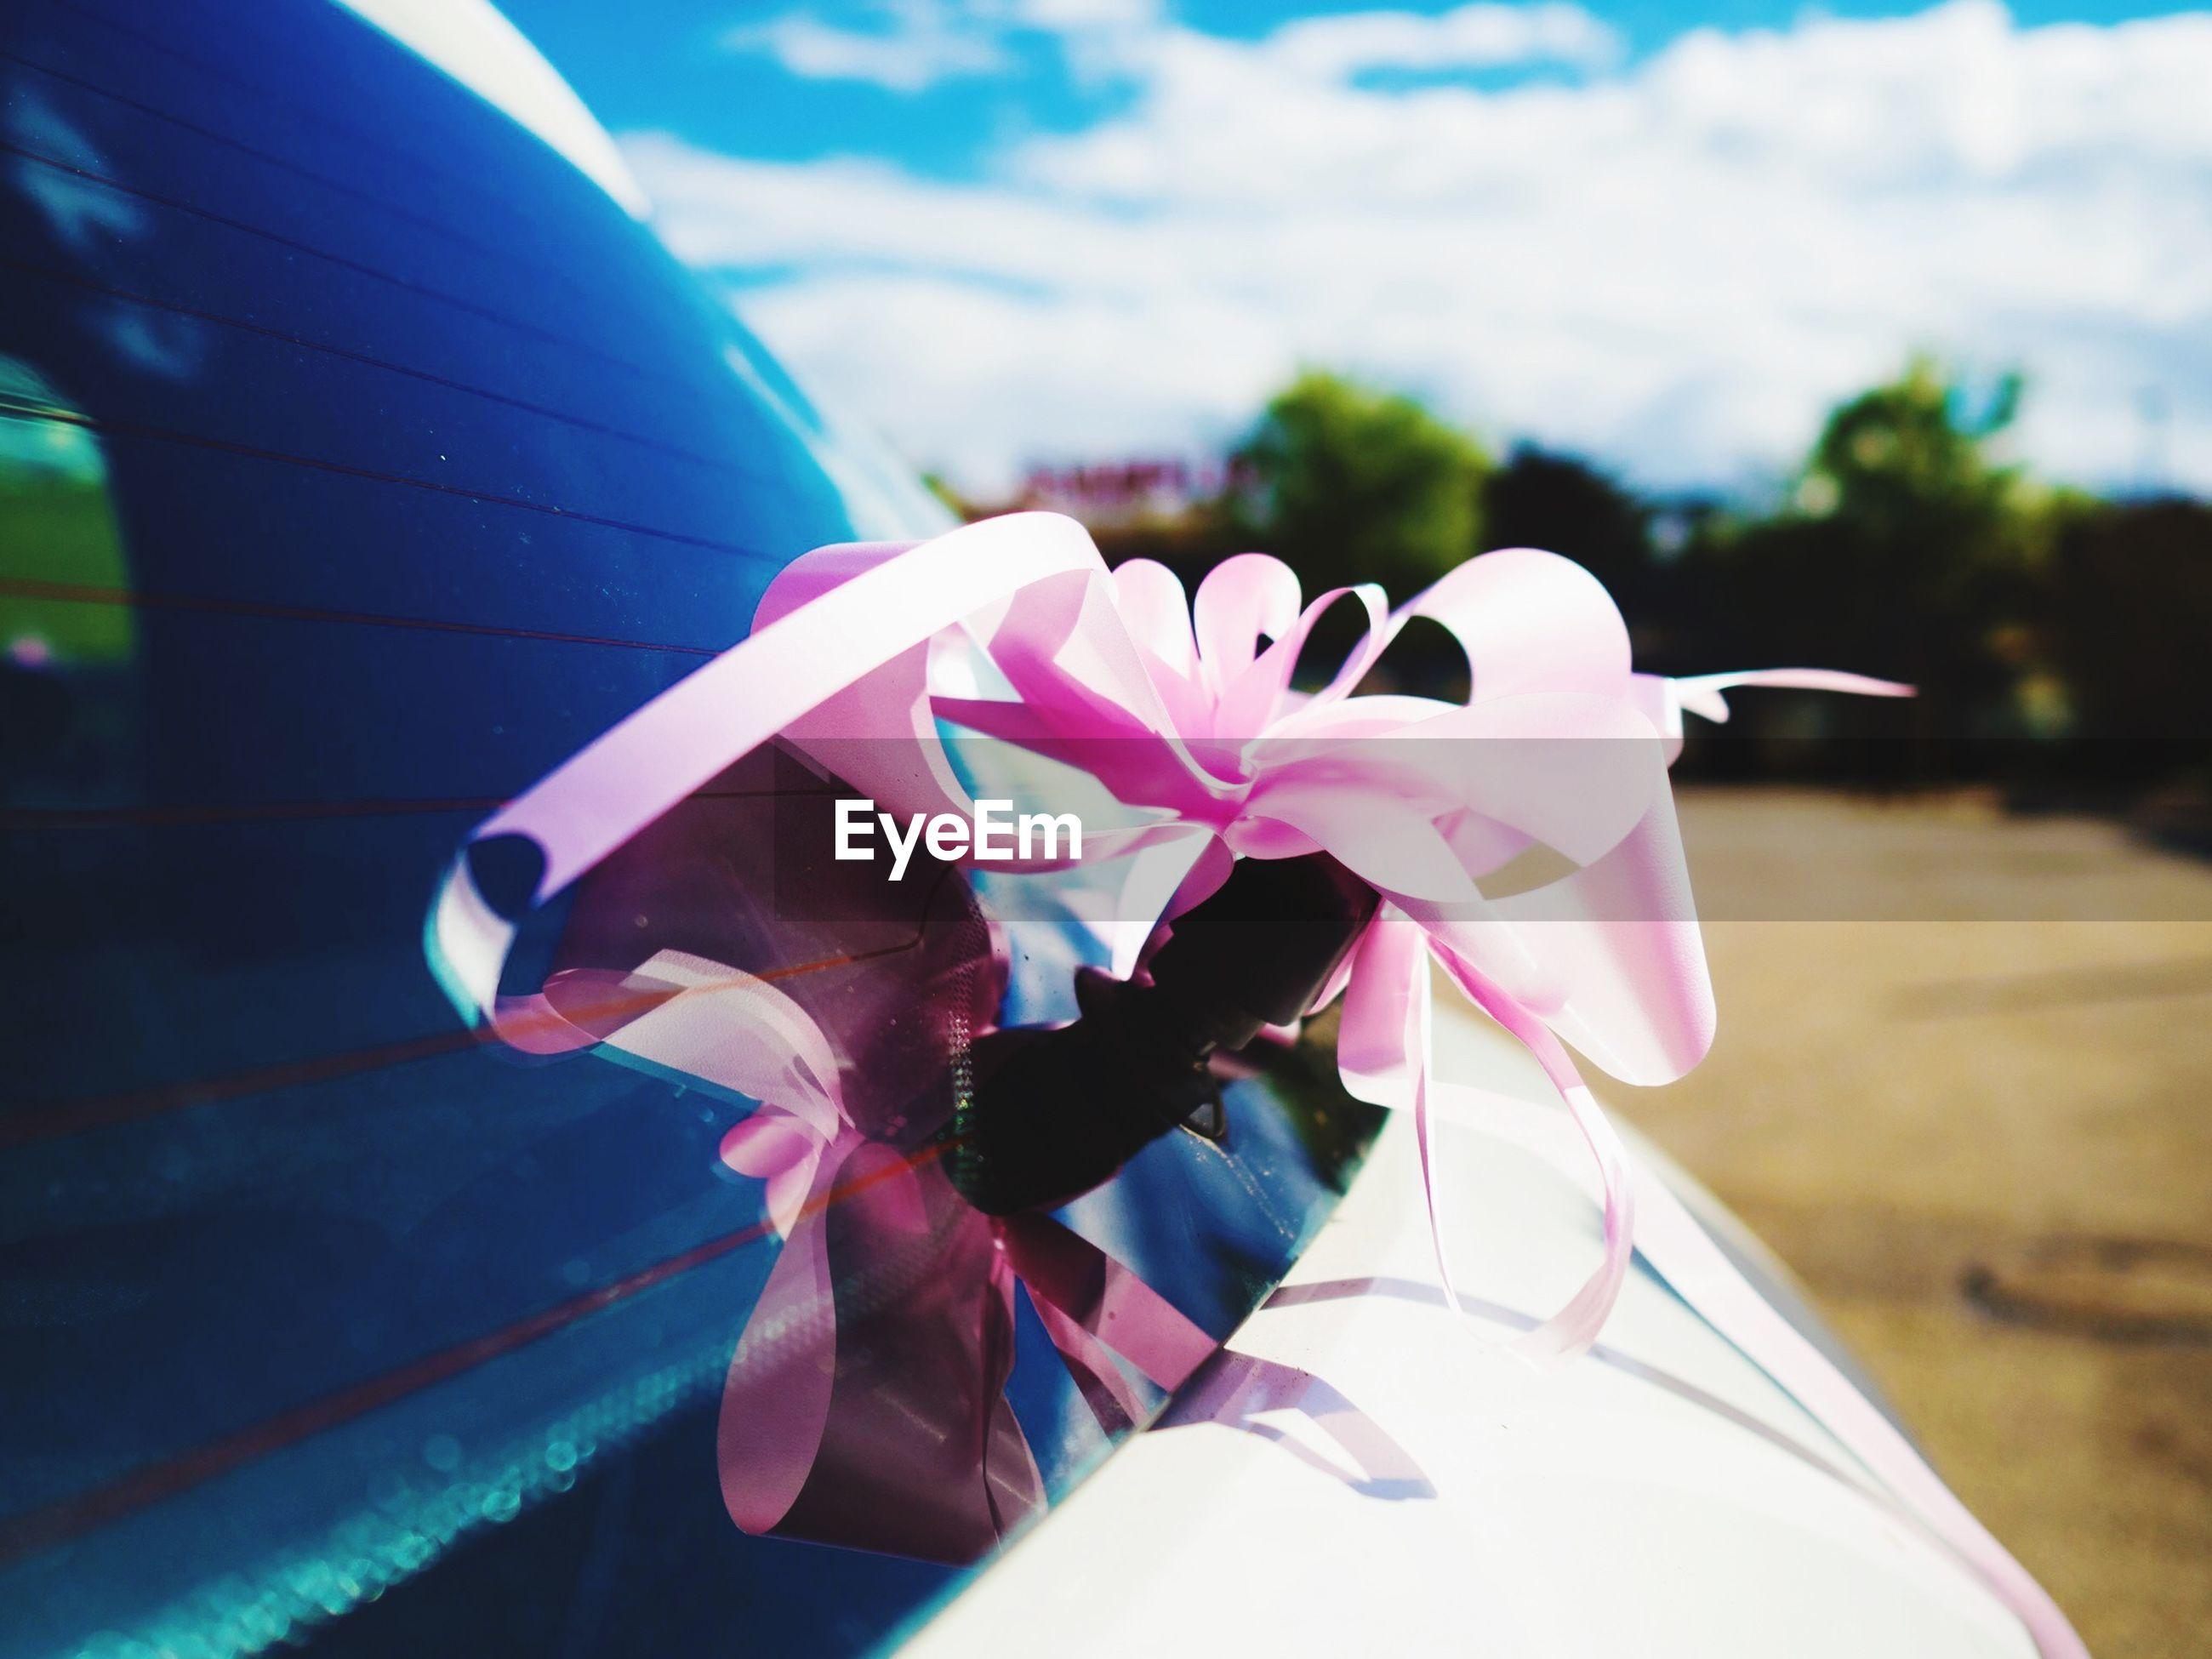 Pink ribbon on car